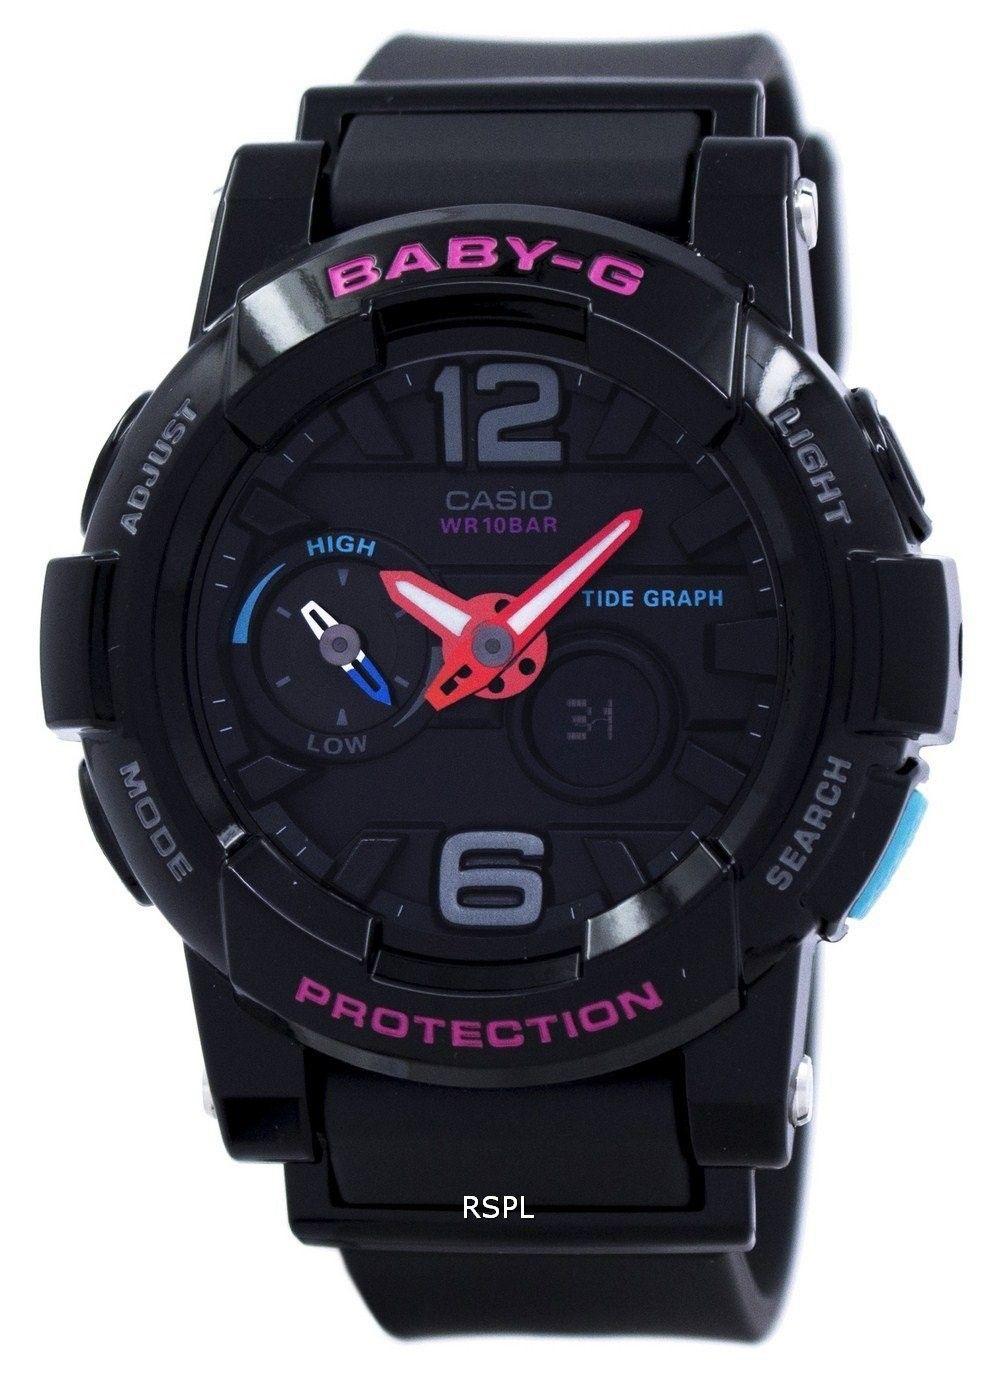 Casio Baby-G Shock Resistant Tide Graph  Analog  Digital BGA-180-1B Women s  Watch c096a2f286